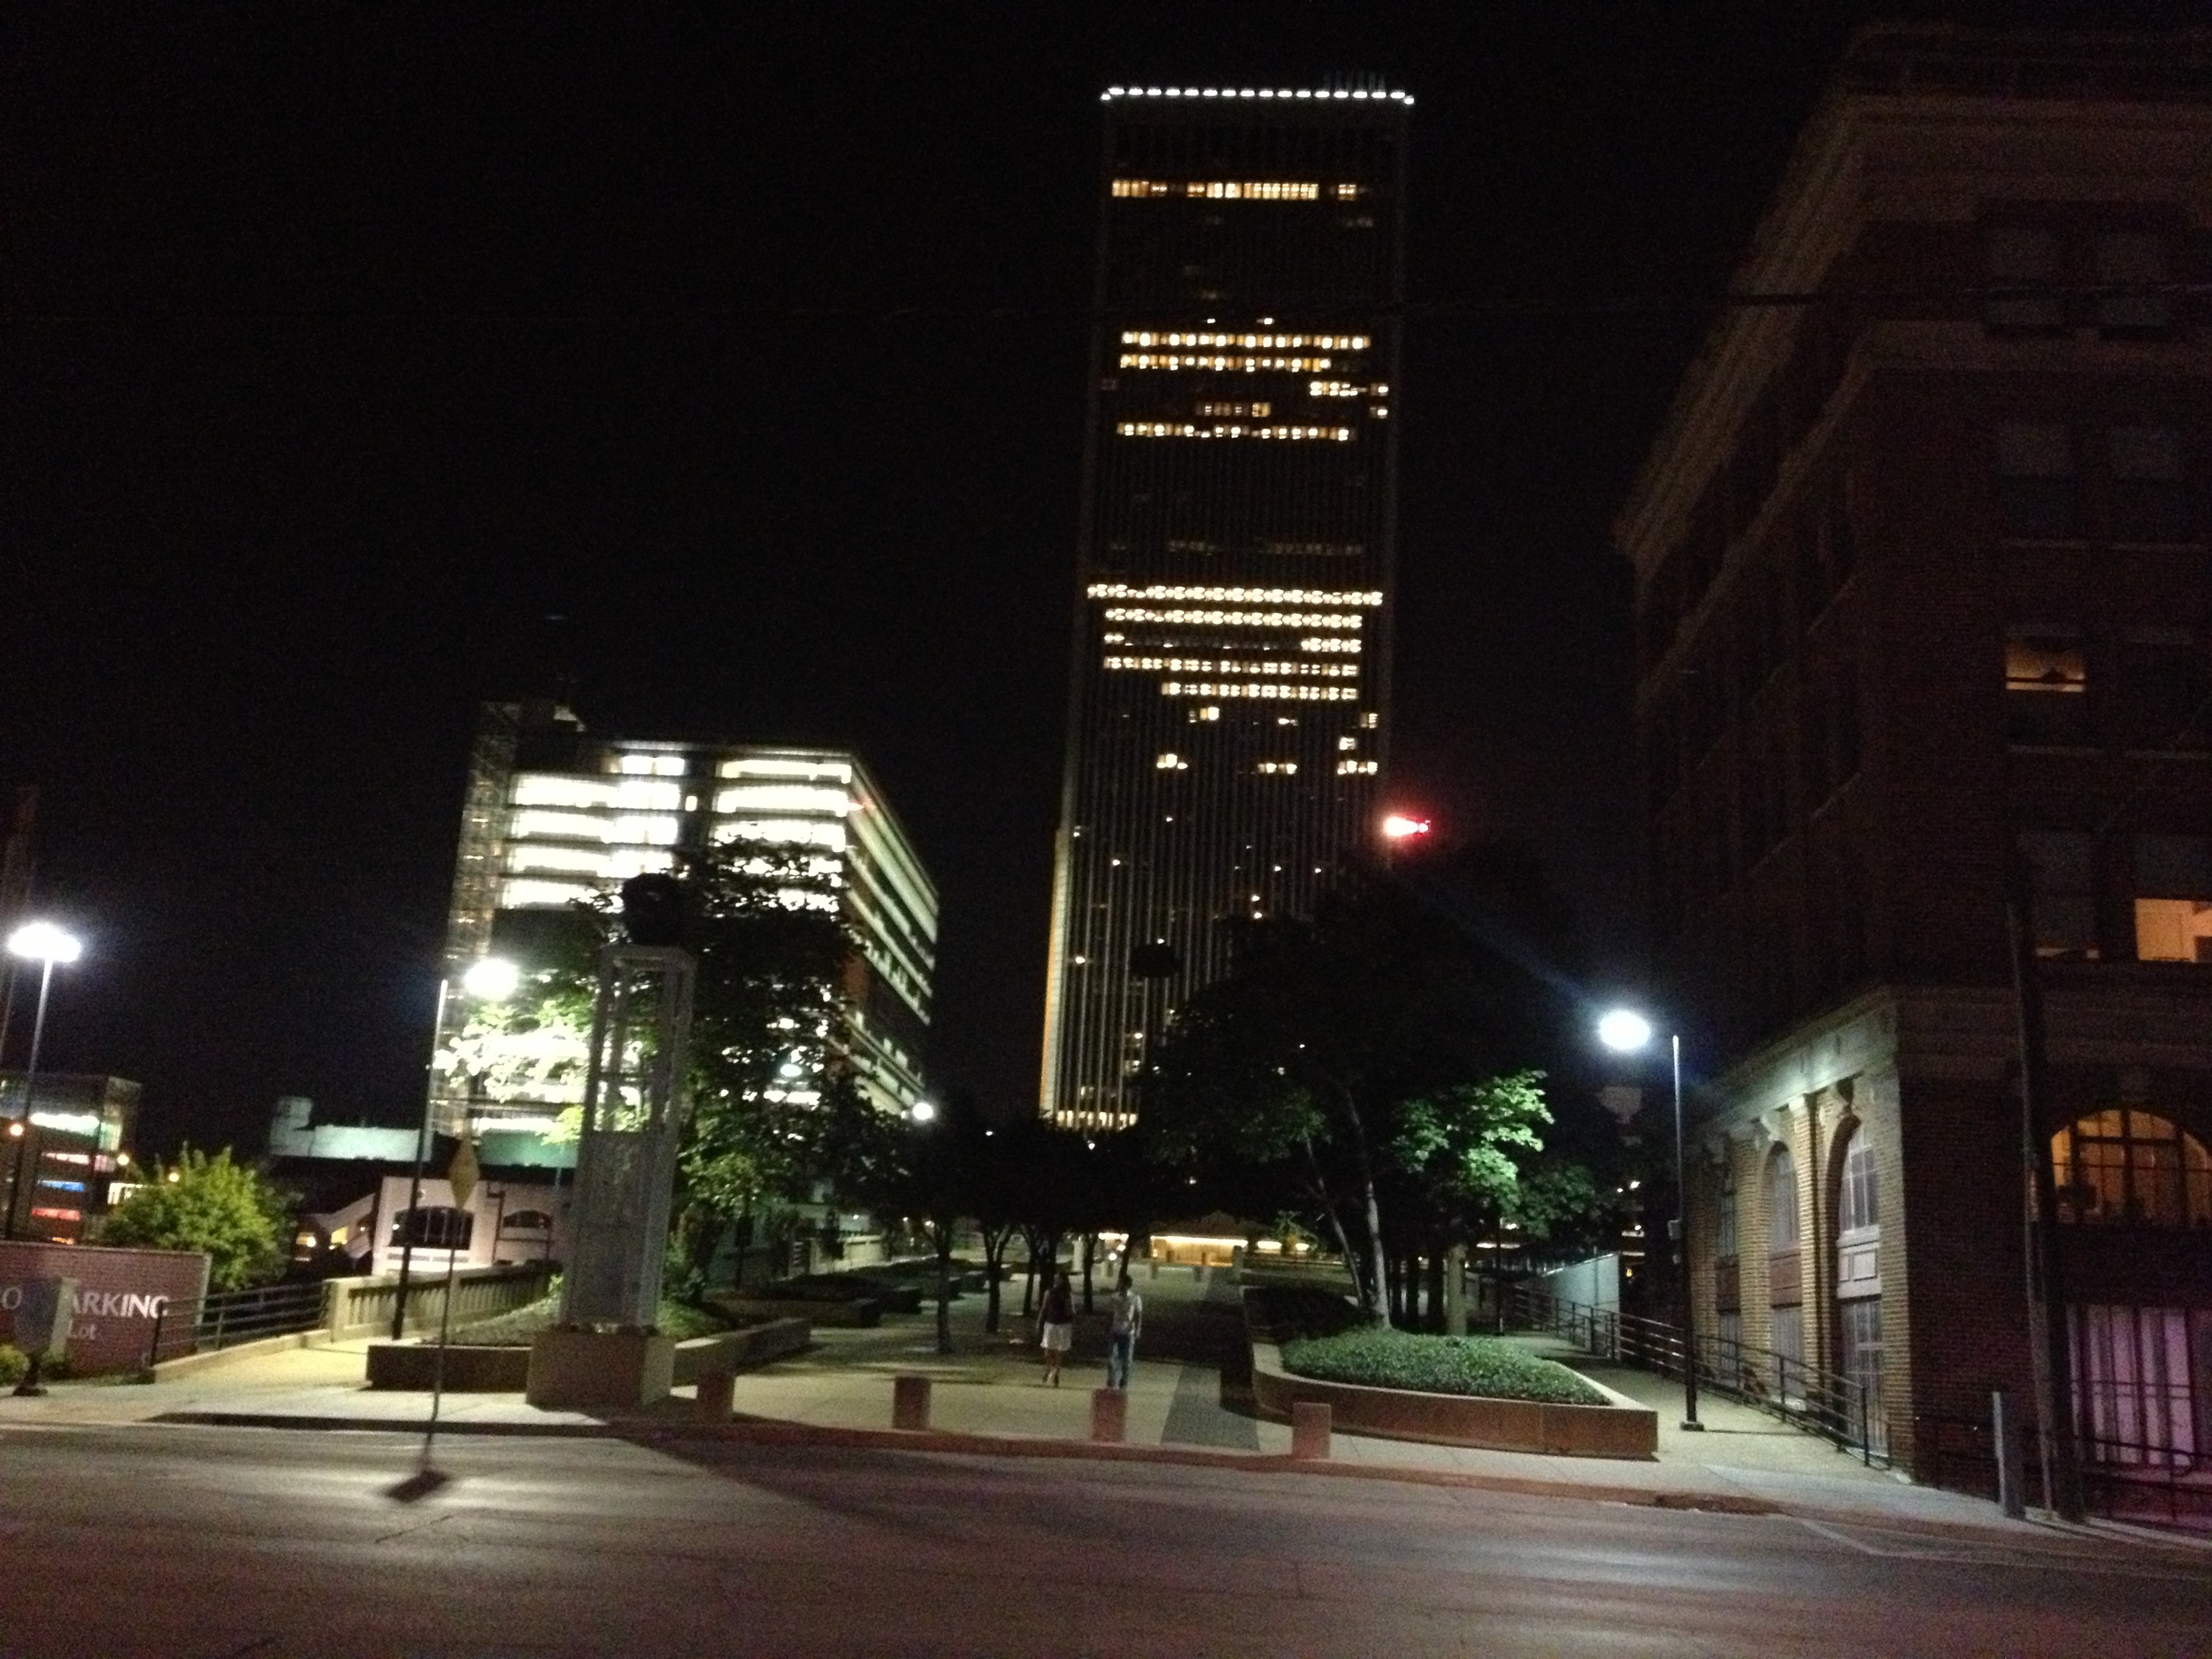 Tulsa BOKTulsa Tower at night